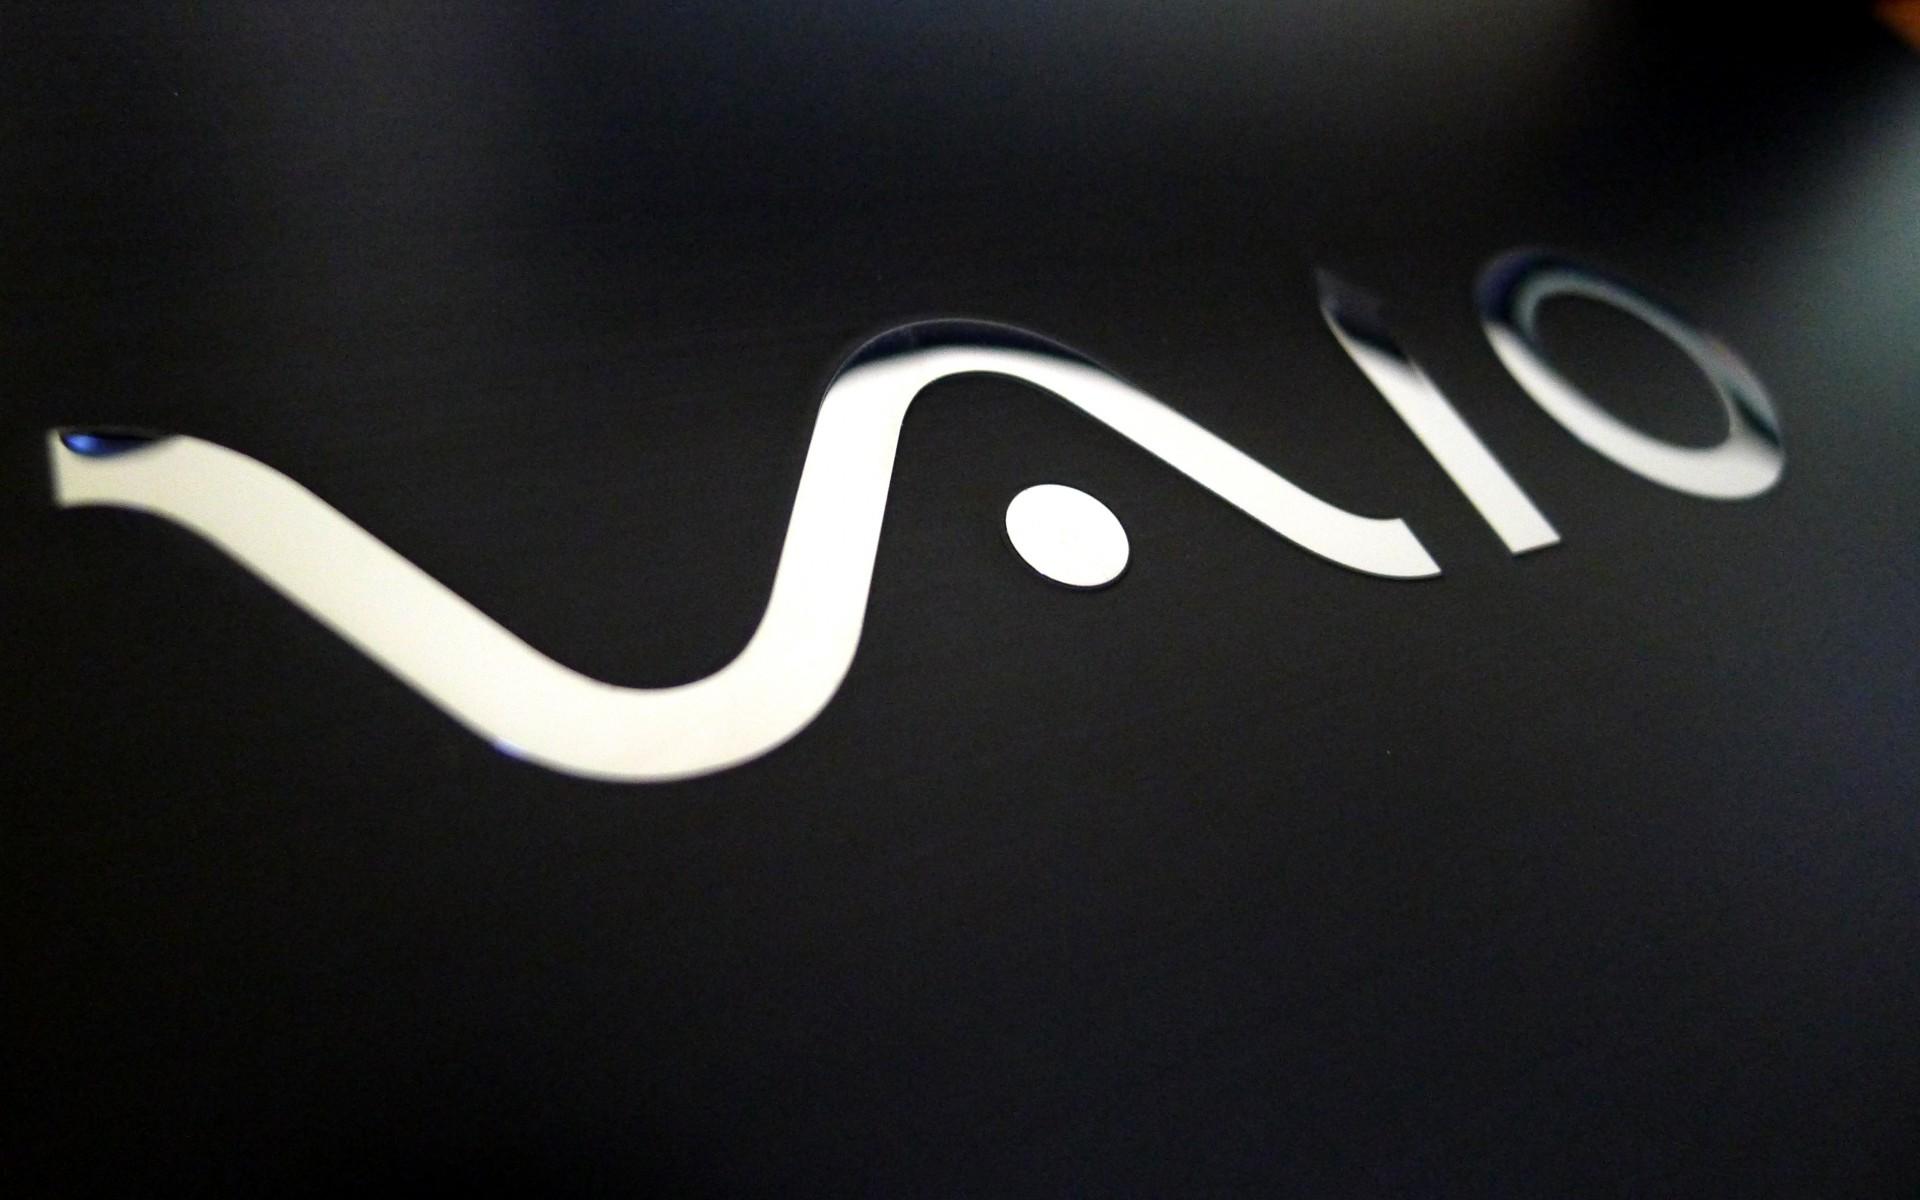 Full Hd 1080p Sony Vaio Wallpapers Hd Desktop Backgrounds